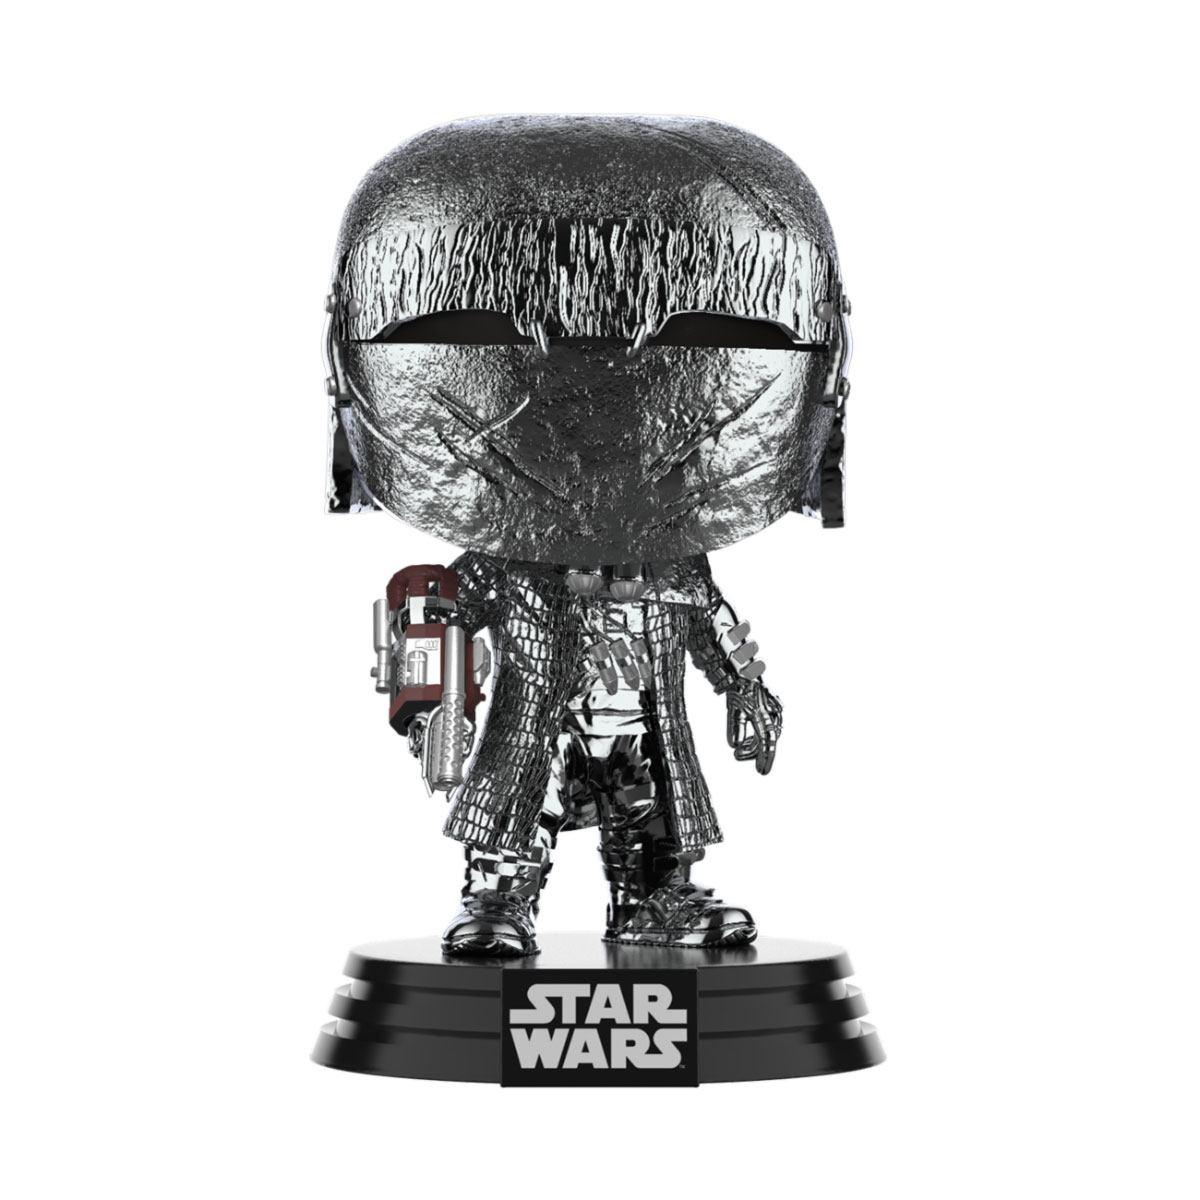 Star Wars POP! Movies Vinyl Figure KOR Cannon (Chrome) 9 cm